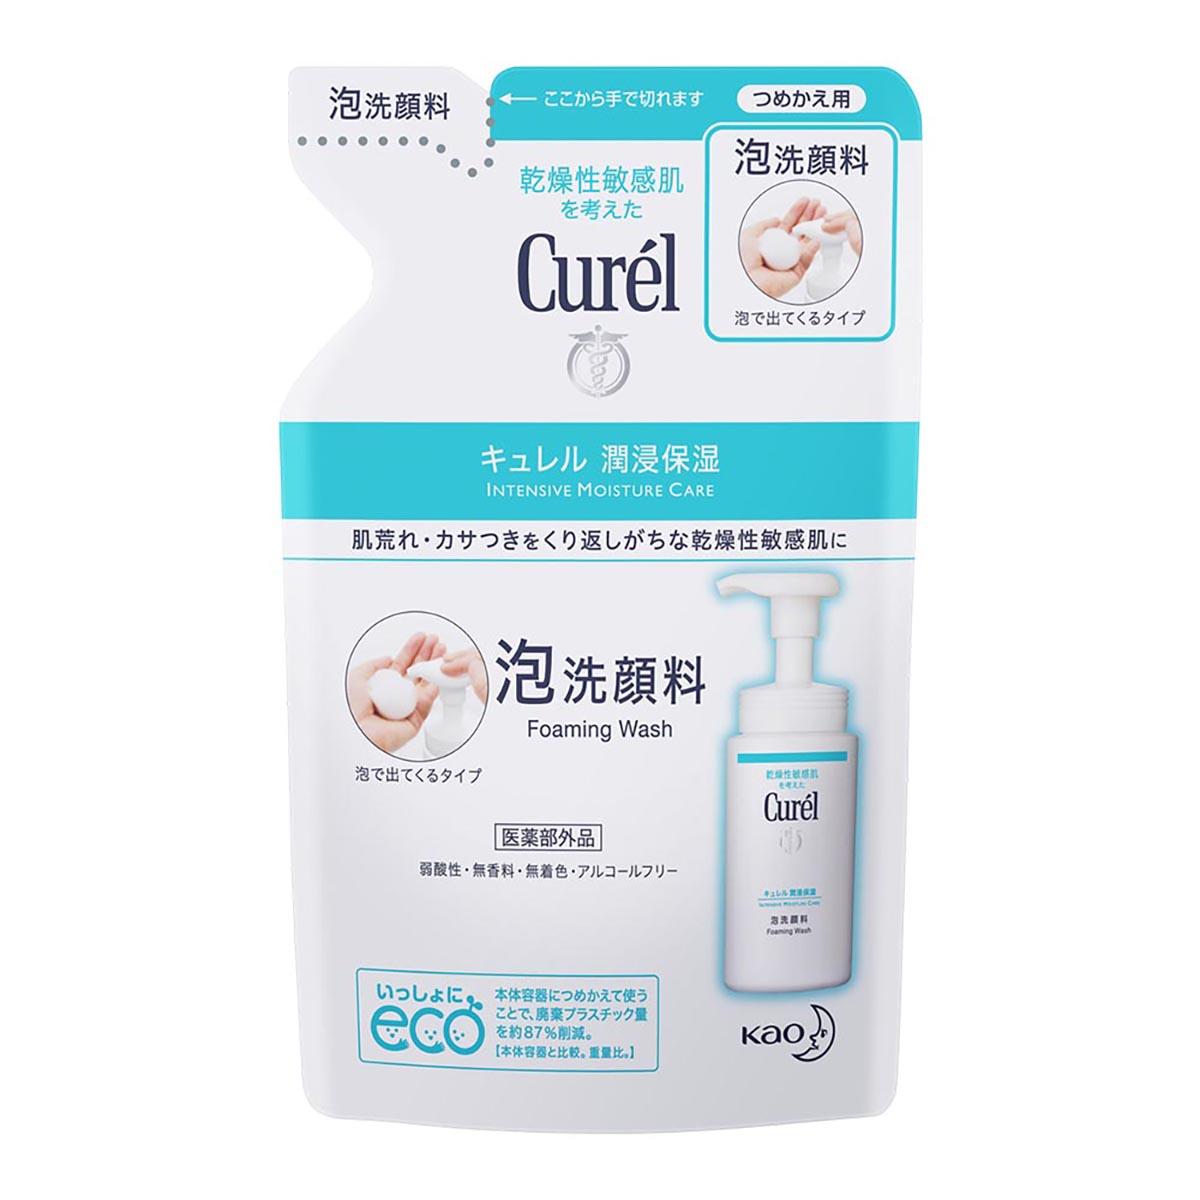 Curel珂潤潤浸保濕洗顏慕絲補充包 【康是美】